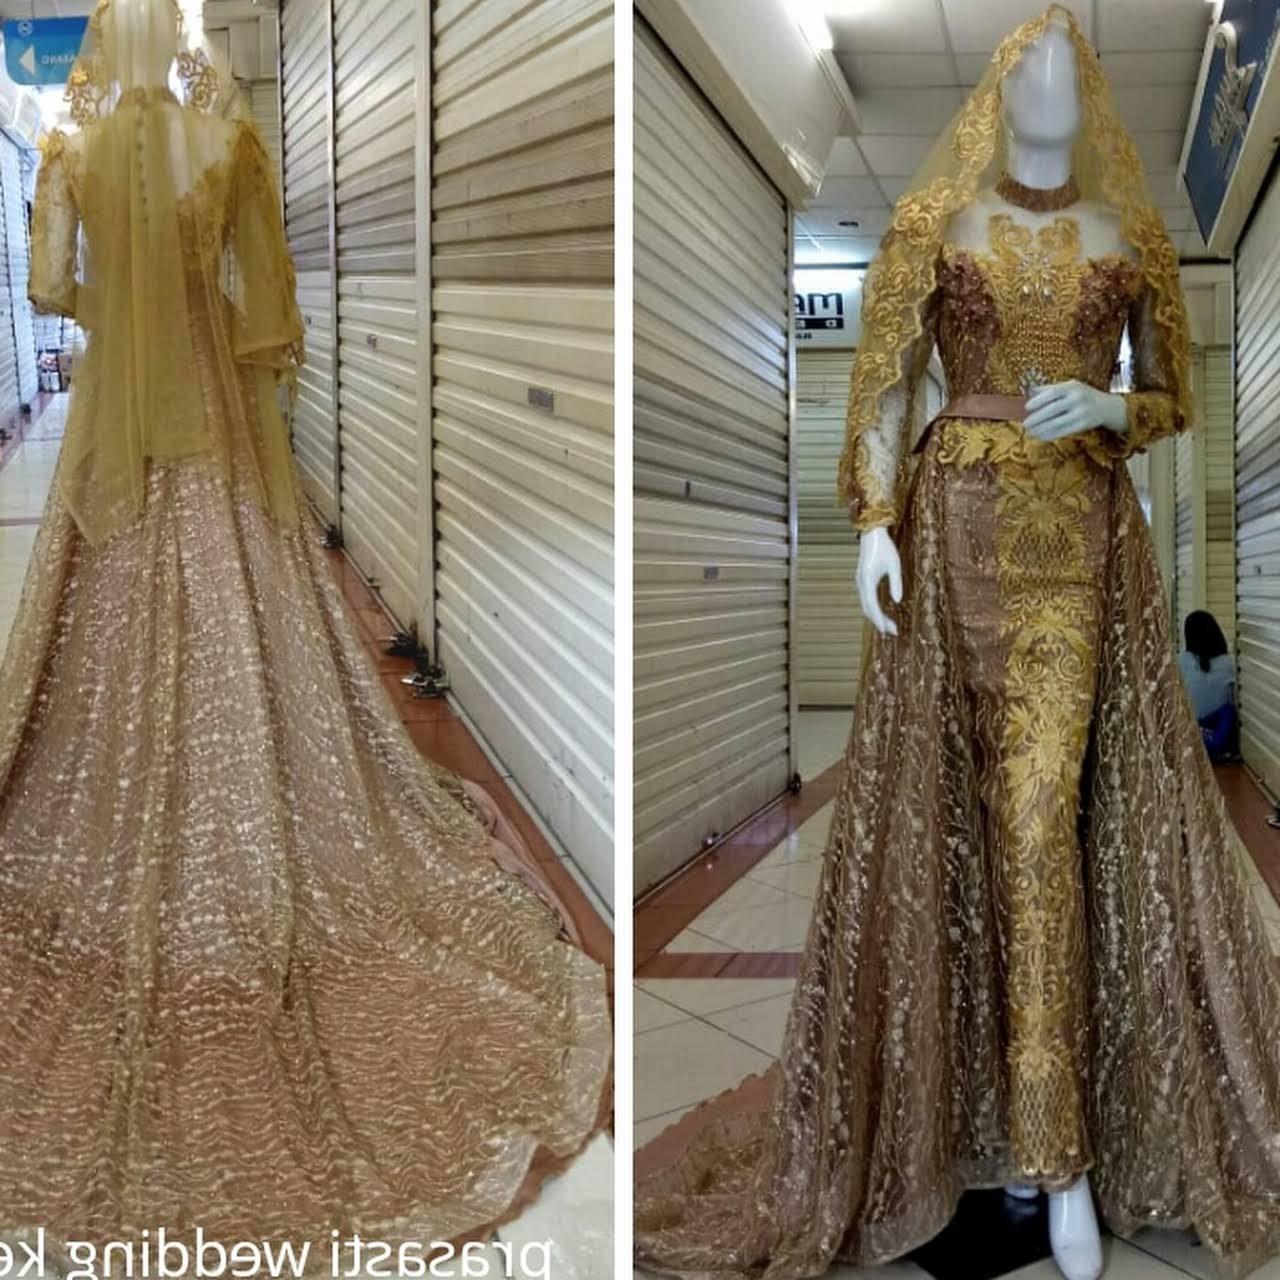 Design Sewa Baju Pengantin Muslimah Di Depok Qwdq Gaun Kebaya Pengantin Muslimah Hijab Syari Layanan Belanja